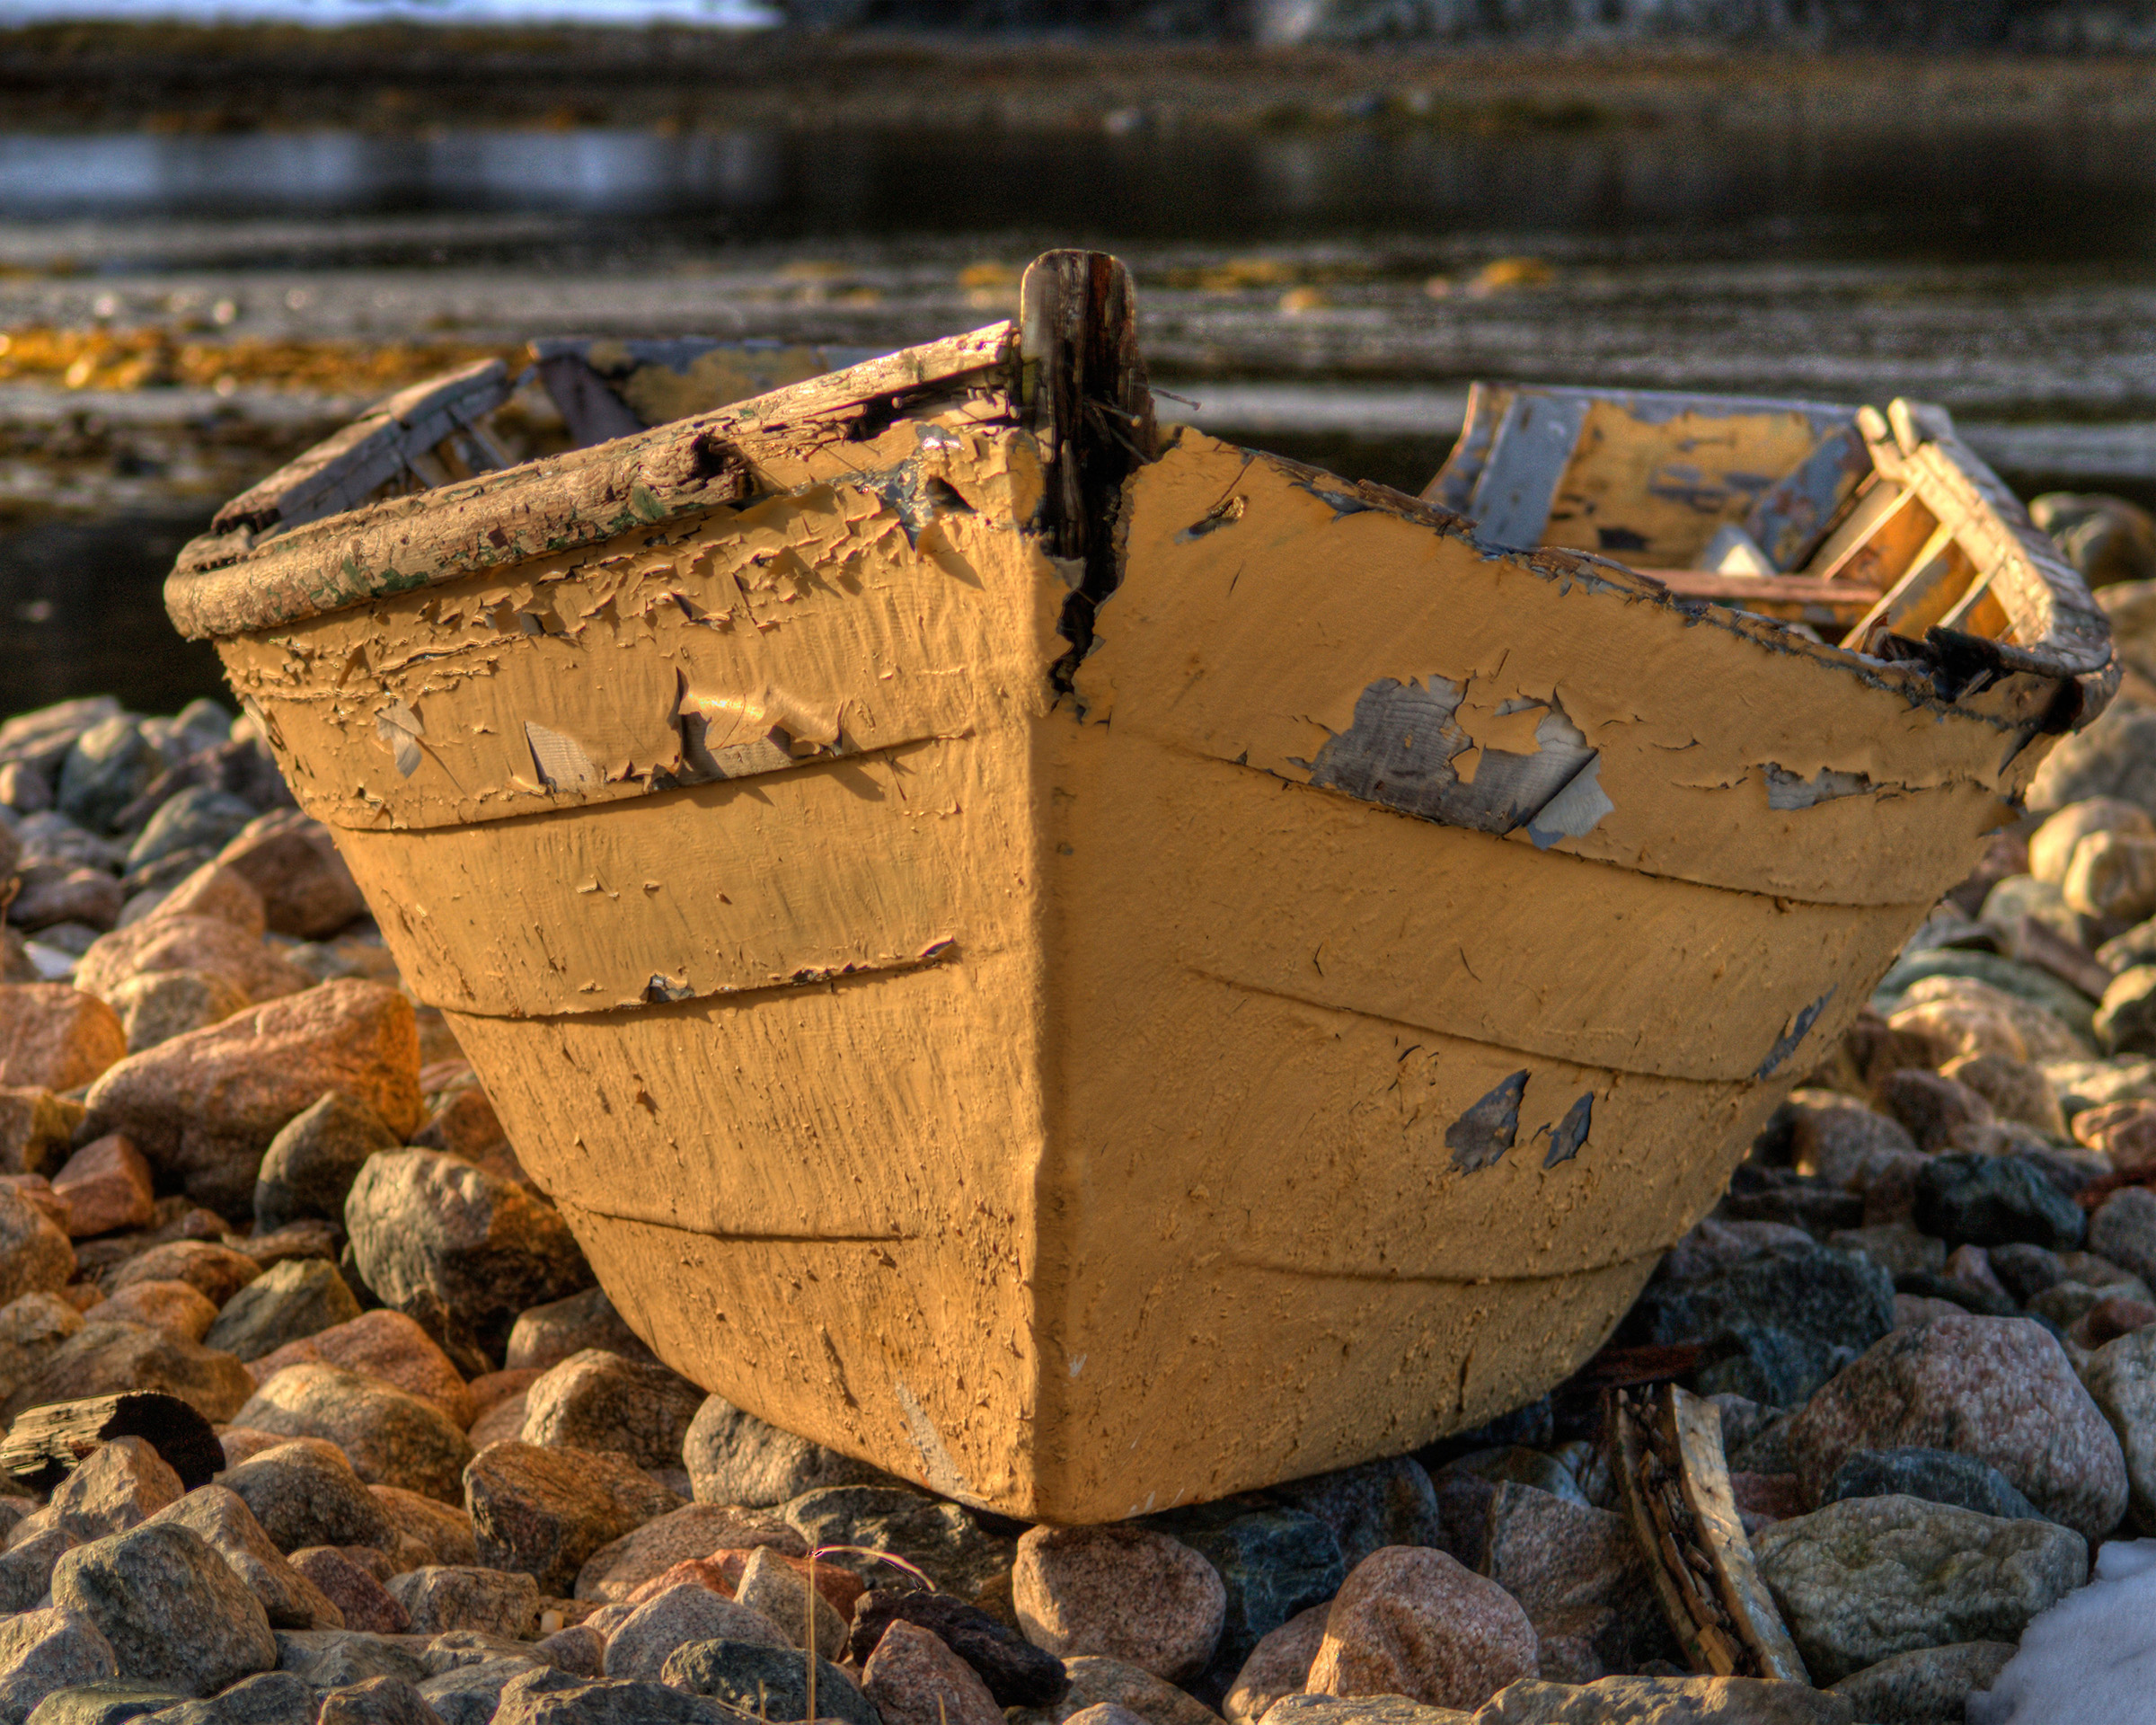 Boat, Abandoned, Travel, Seaside, Ship, HQ Photo